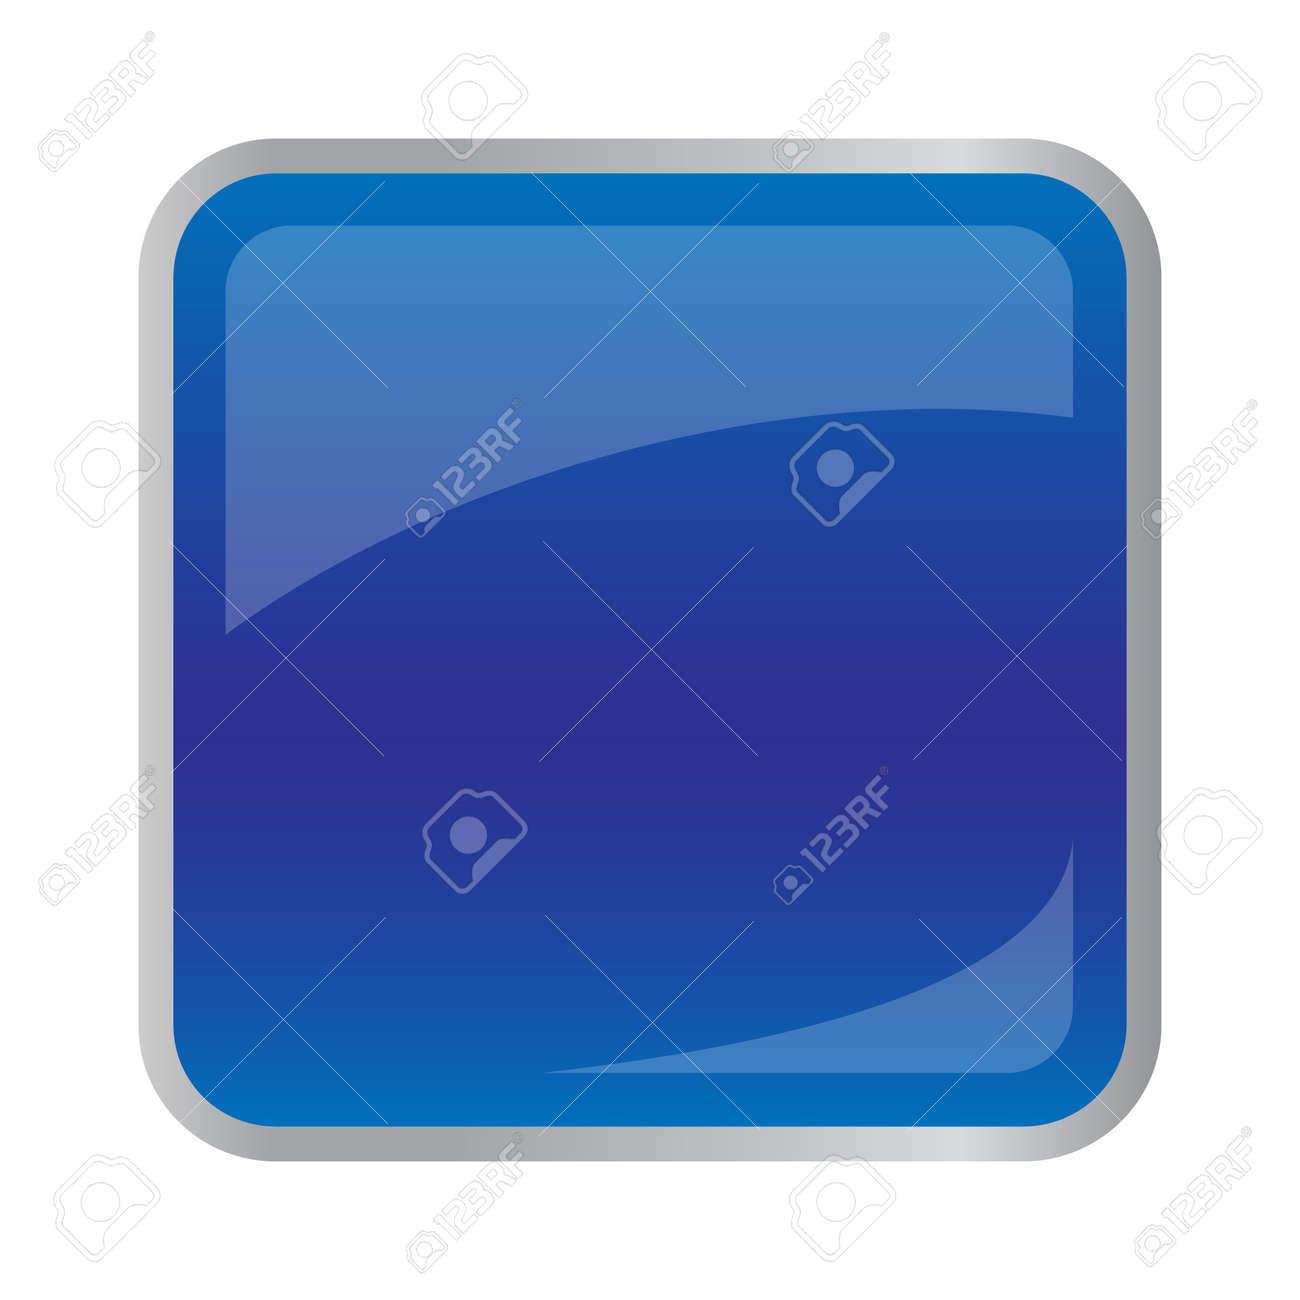 Square dark blue button for website Stock Vector - 35576605